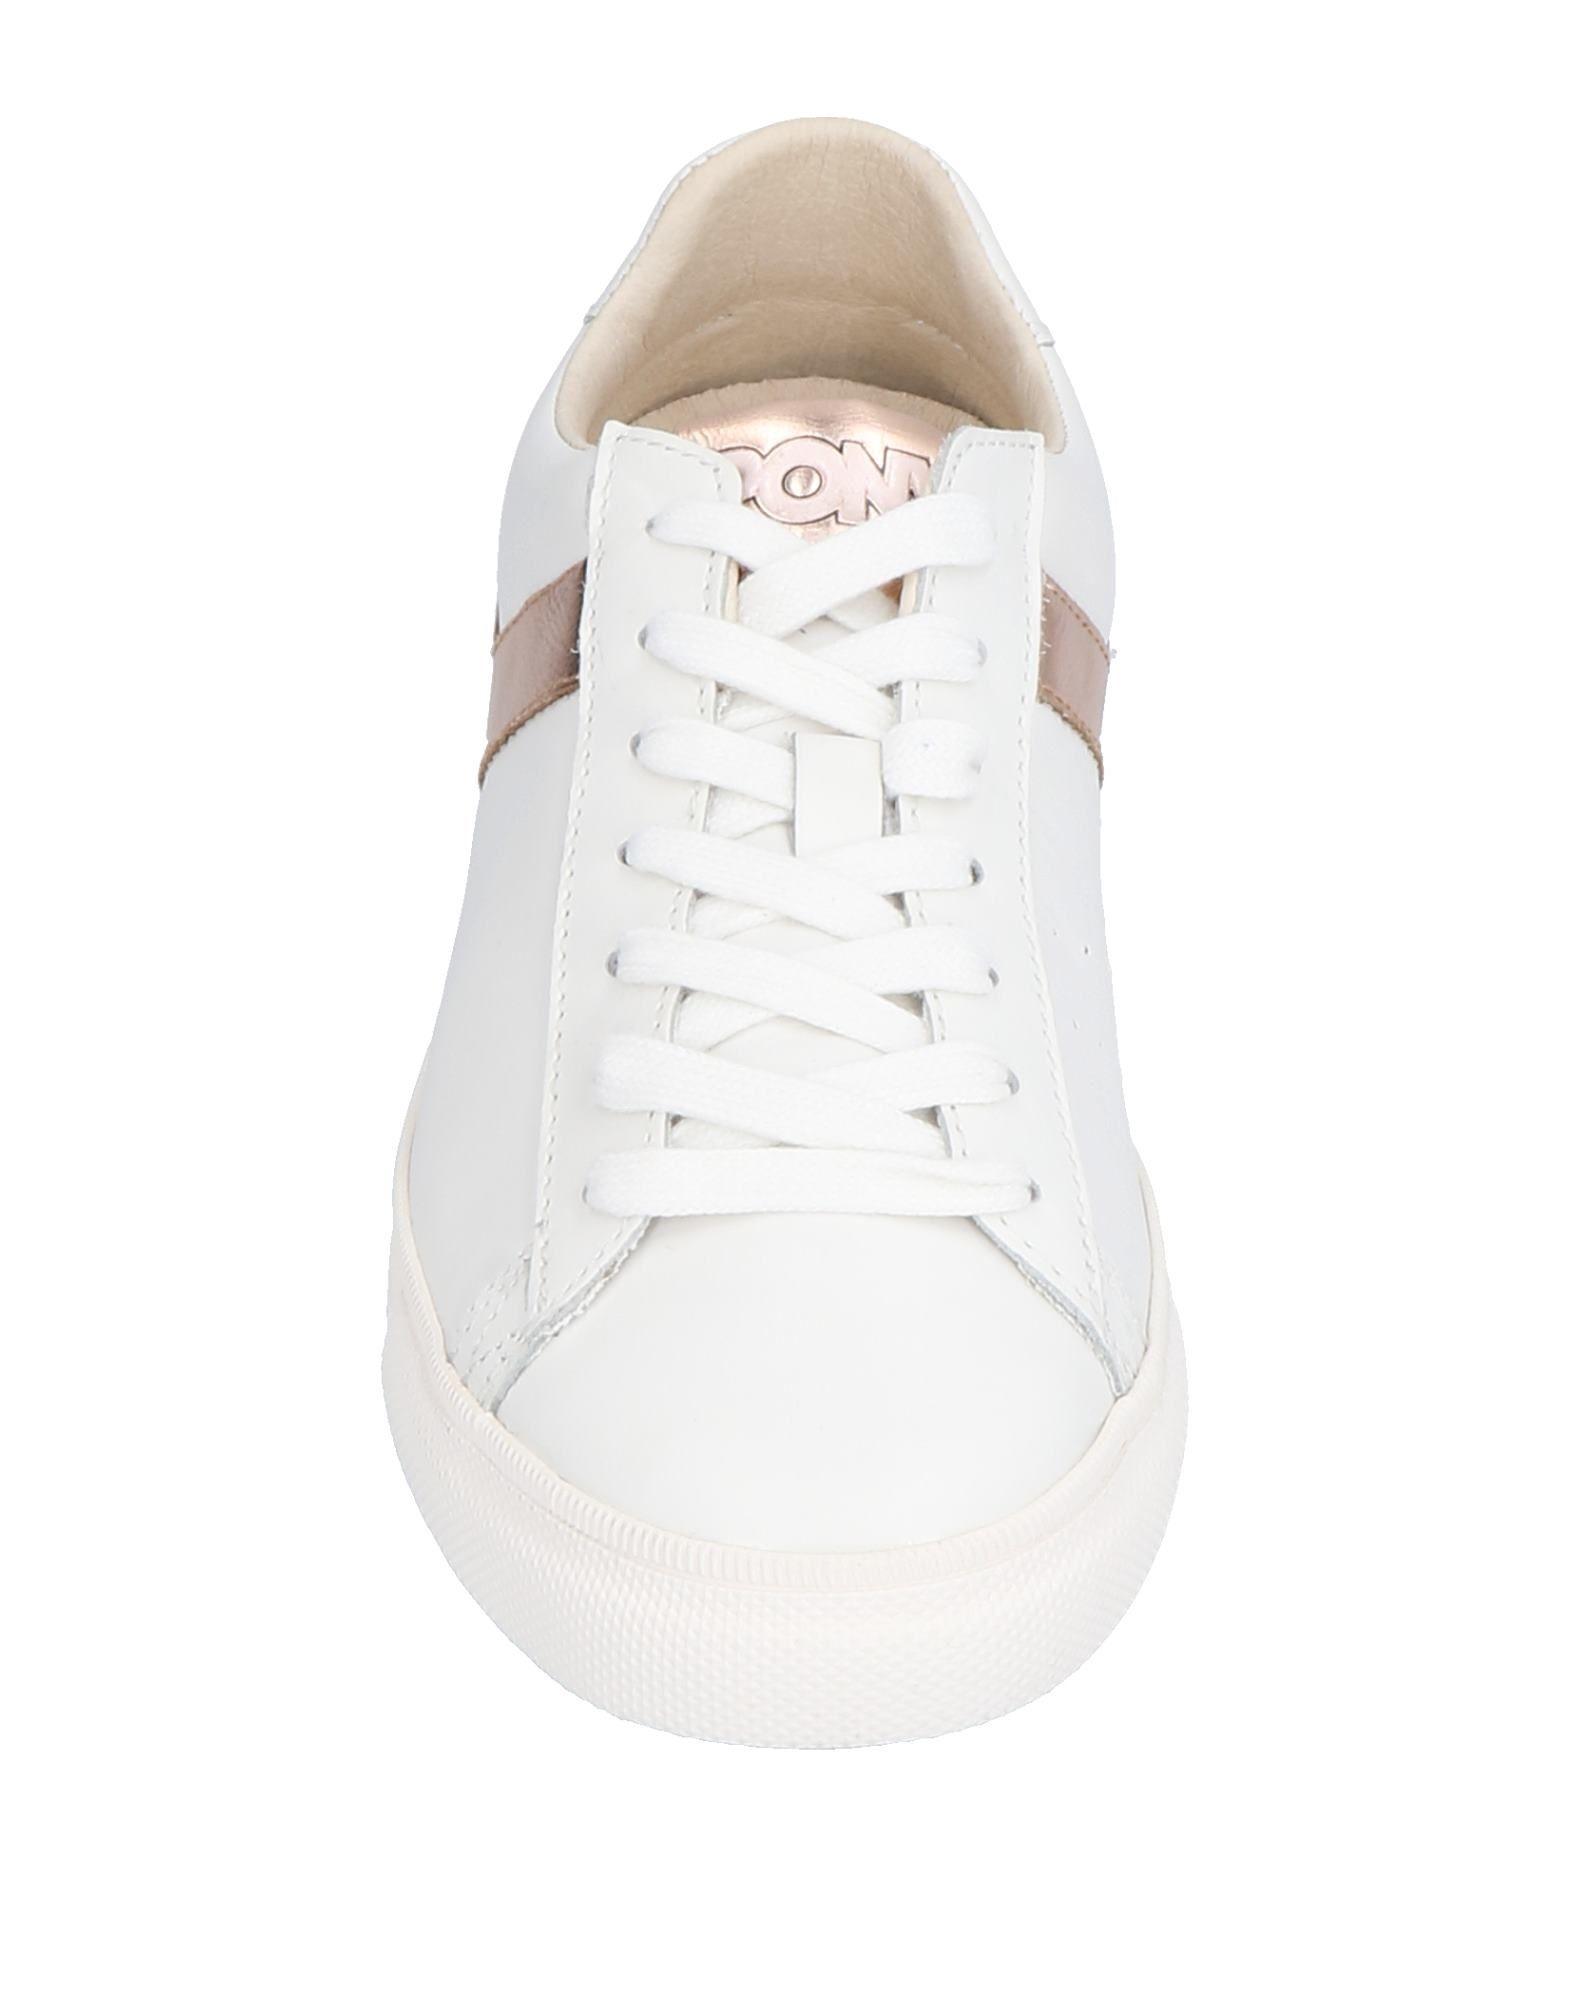 Pony Gute Sneakers Damen  11496532VO Gute Pony Qualität beliebte Schuhe 942908